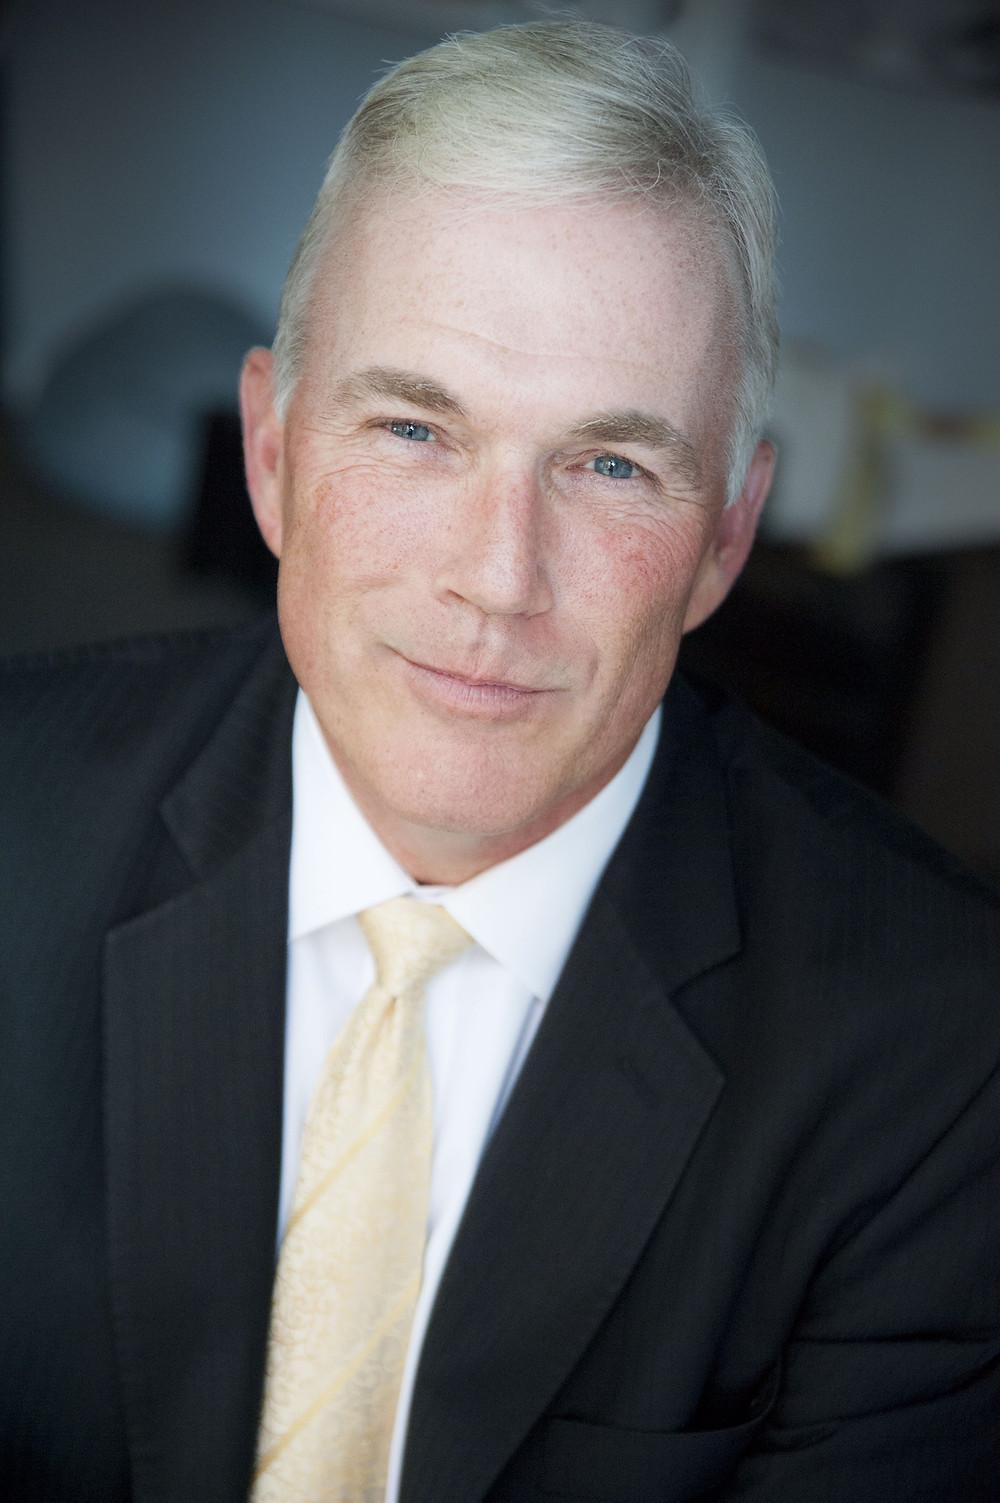 MICHAEL K. SMITH, MANAGING PARTNER, INSIGHT FINANCIAL PARTNERS